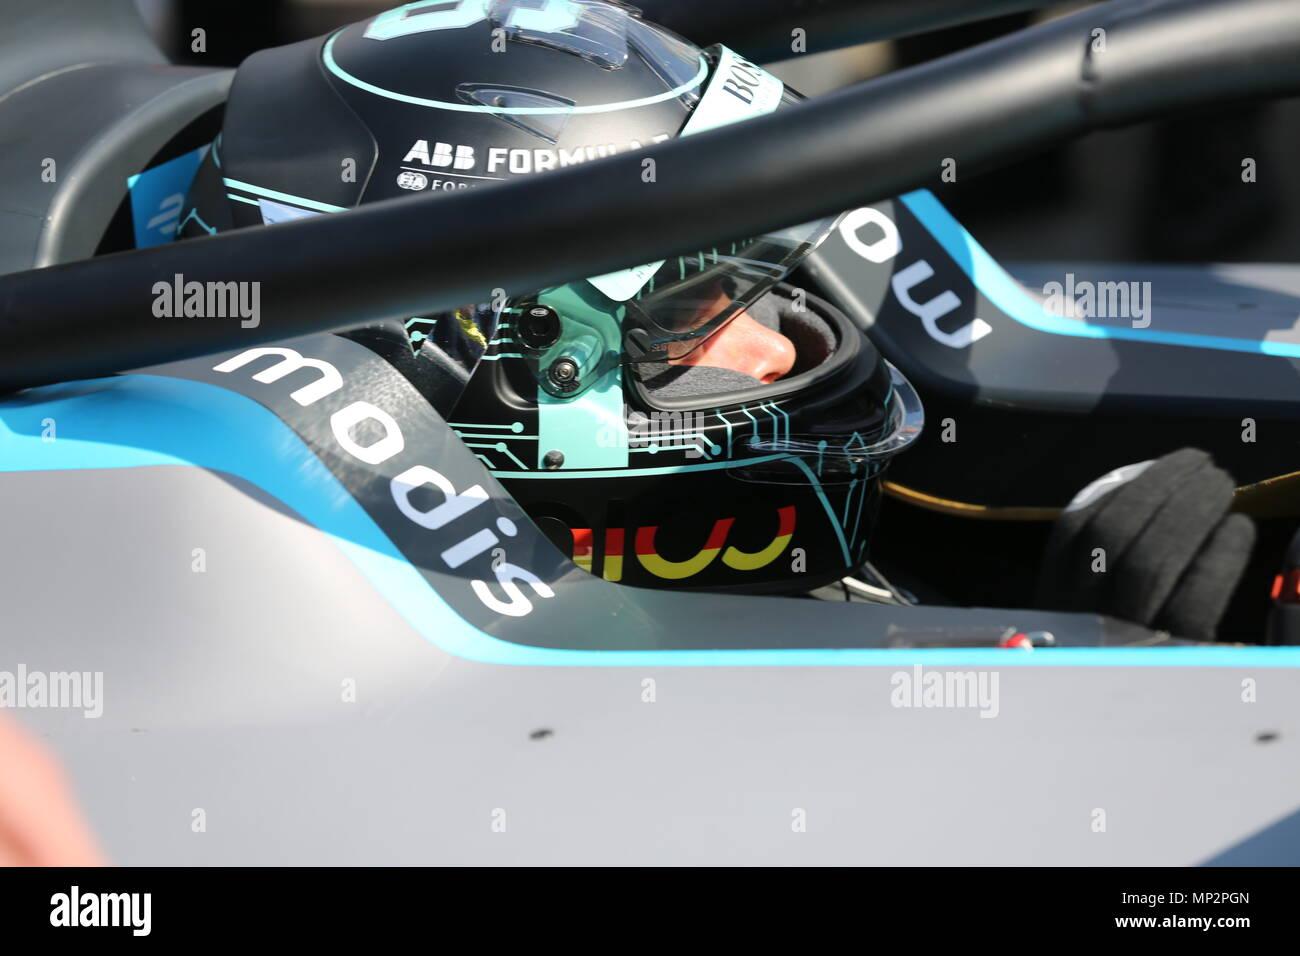 Formula E Electric Racer Photos Formula E Electric Racer Images